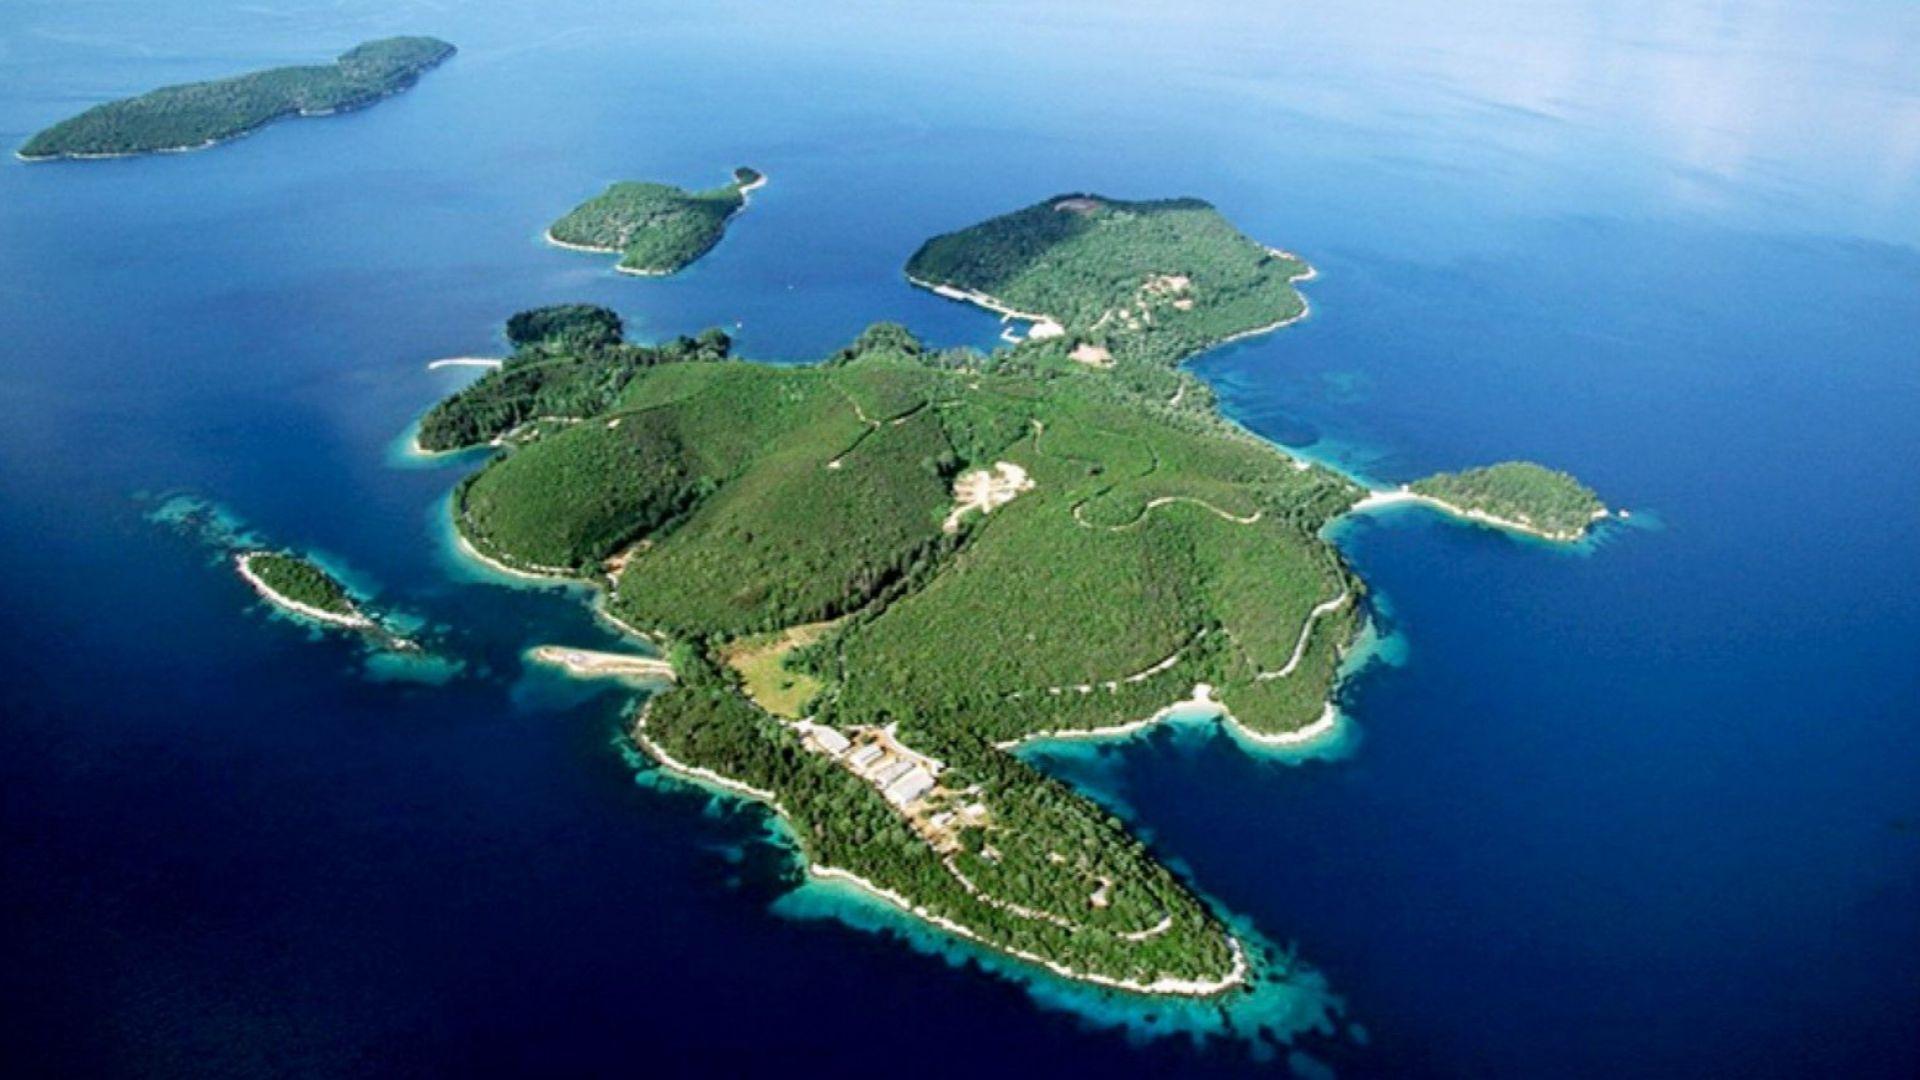 Остров Скорпиос - страшната семейна прокоба на рода Онасис